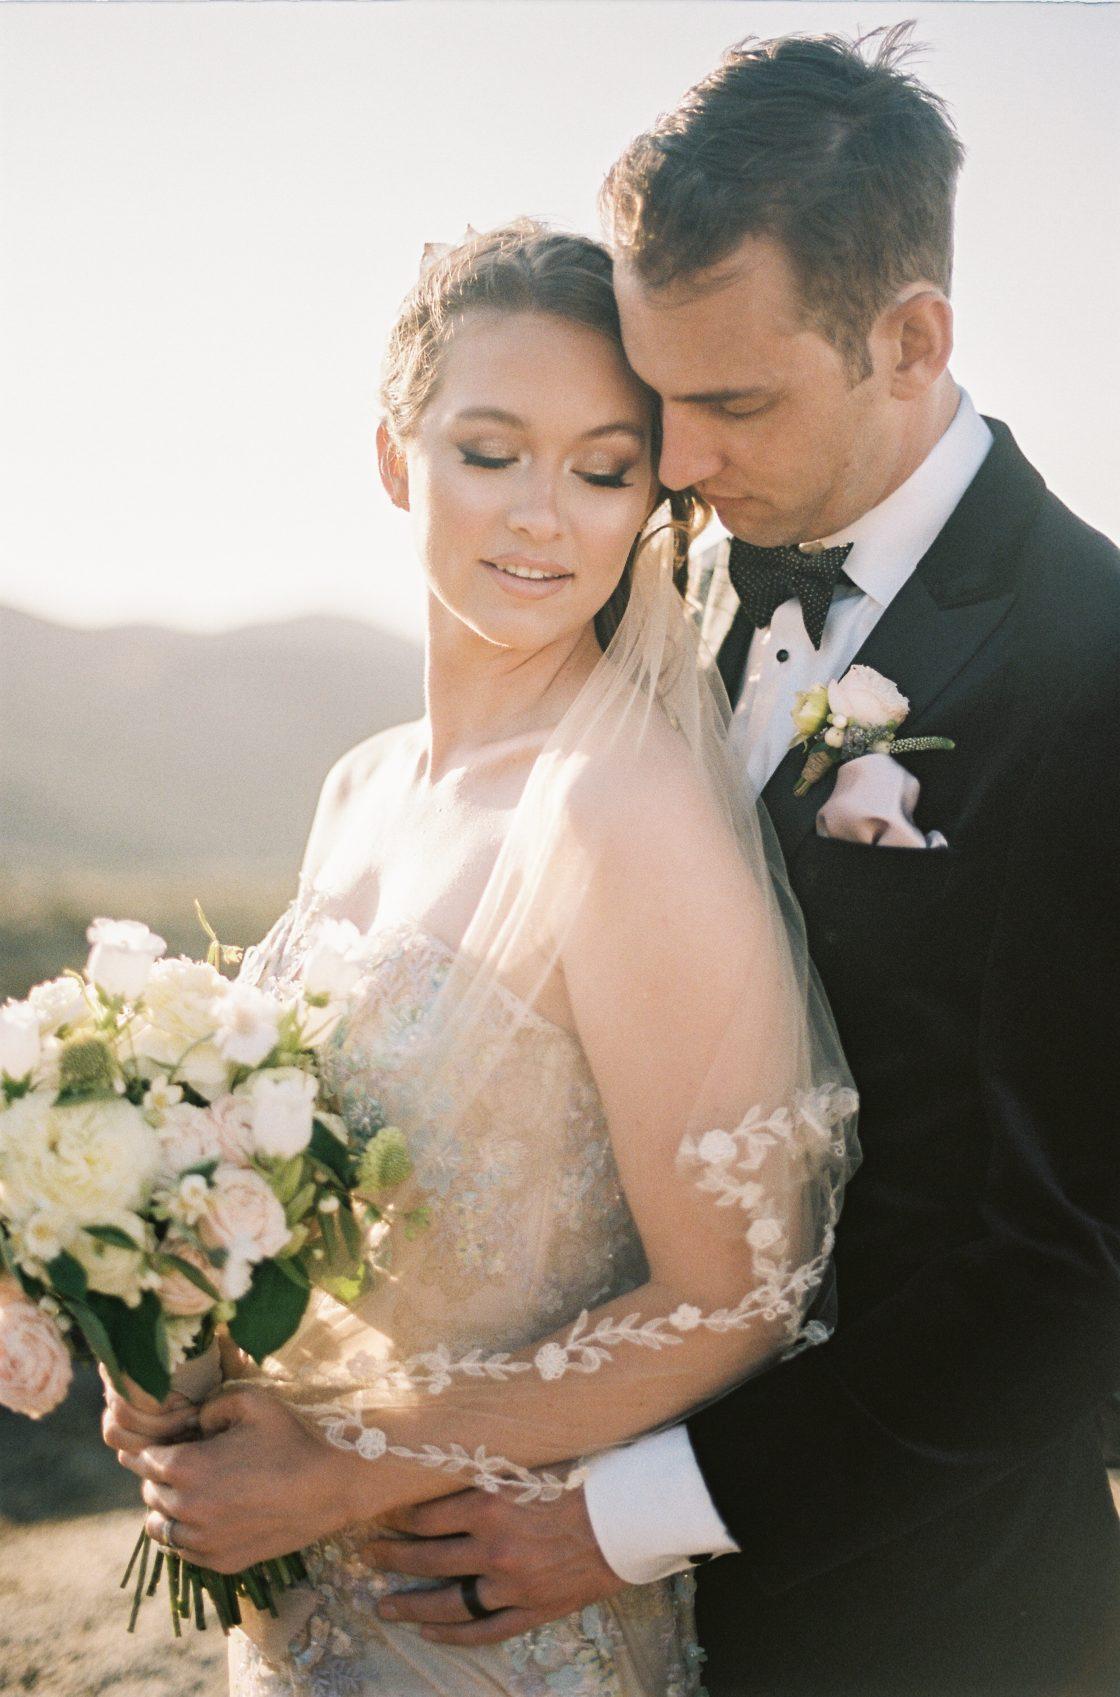 Golden Lavender Farm Wedding Inspiration